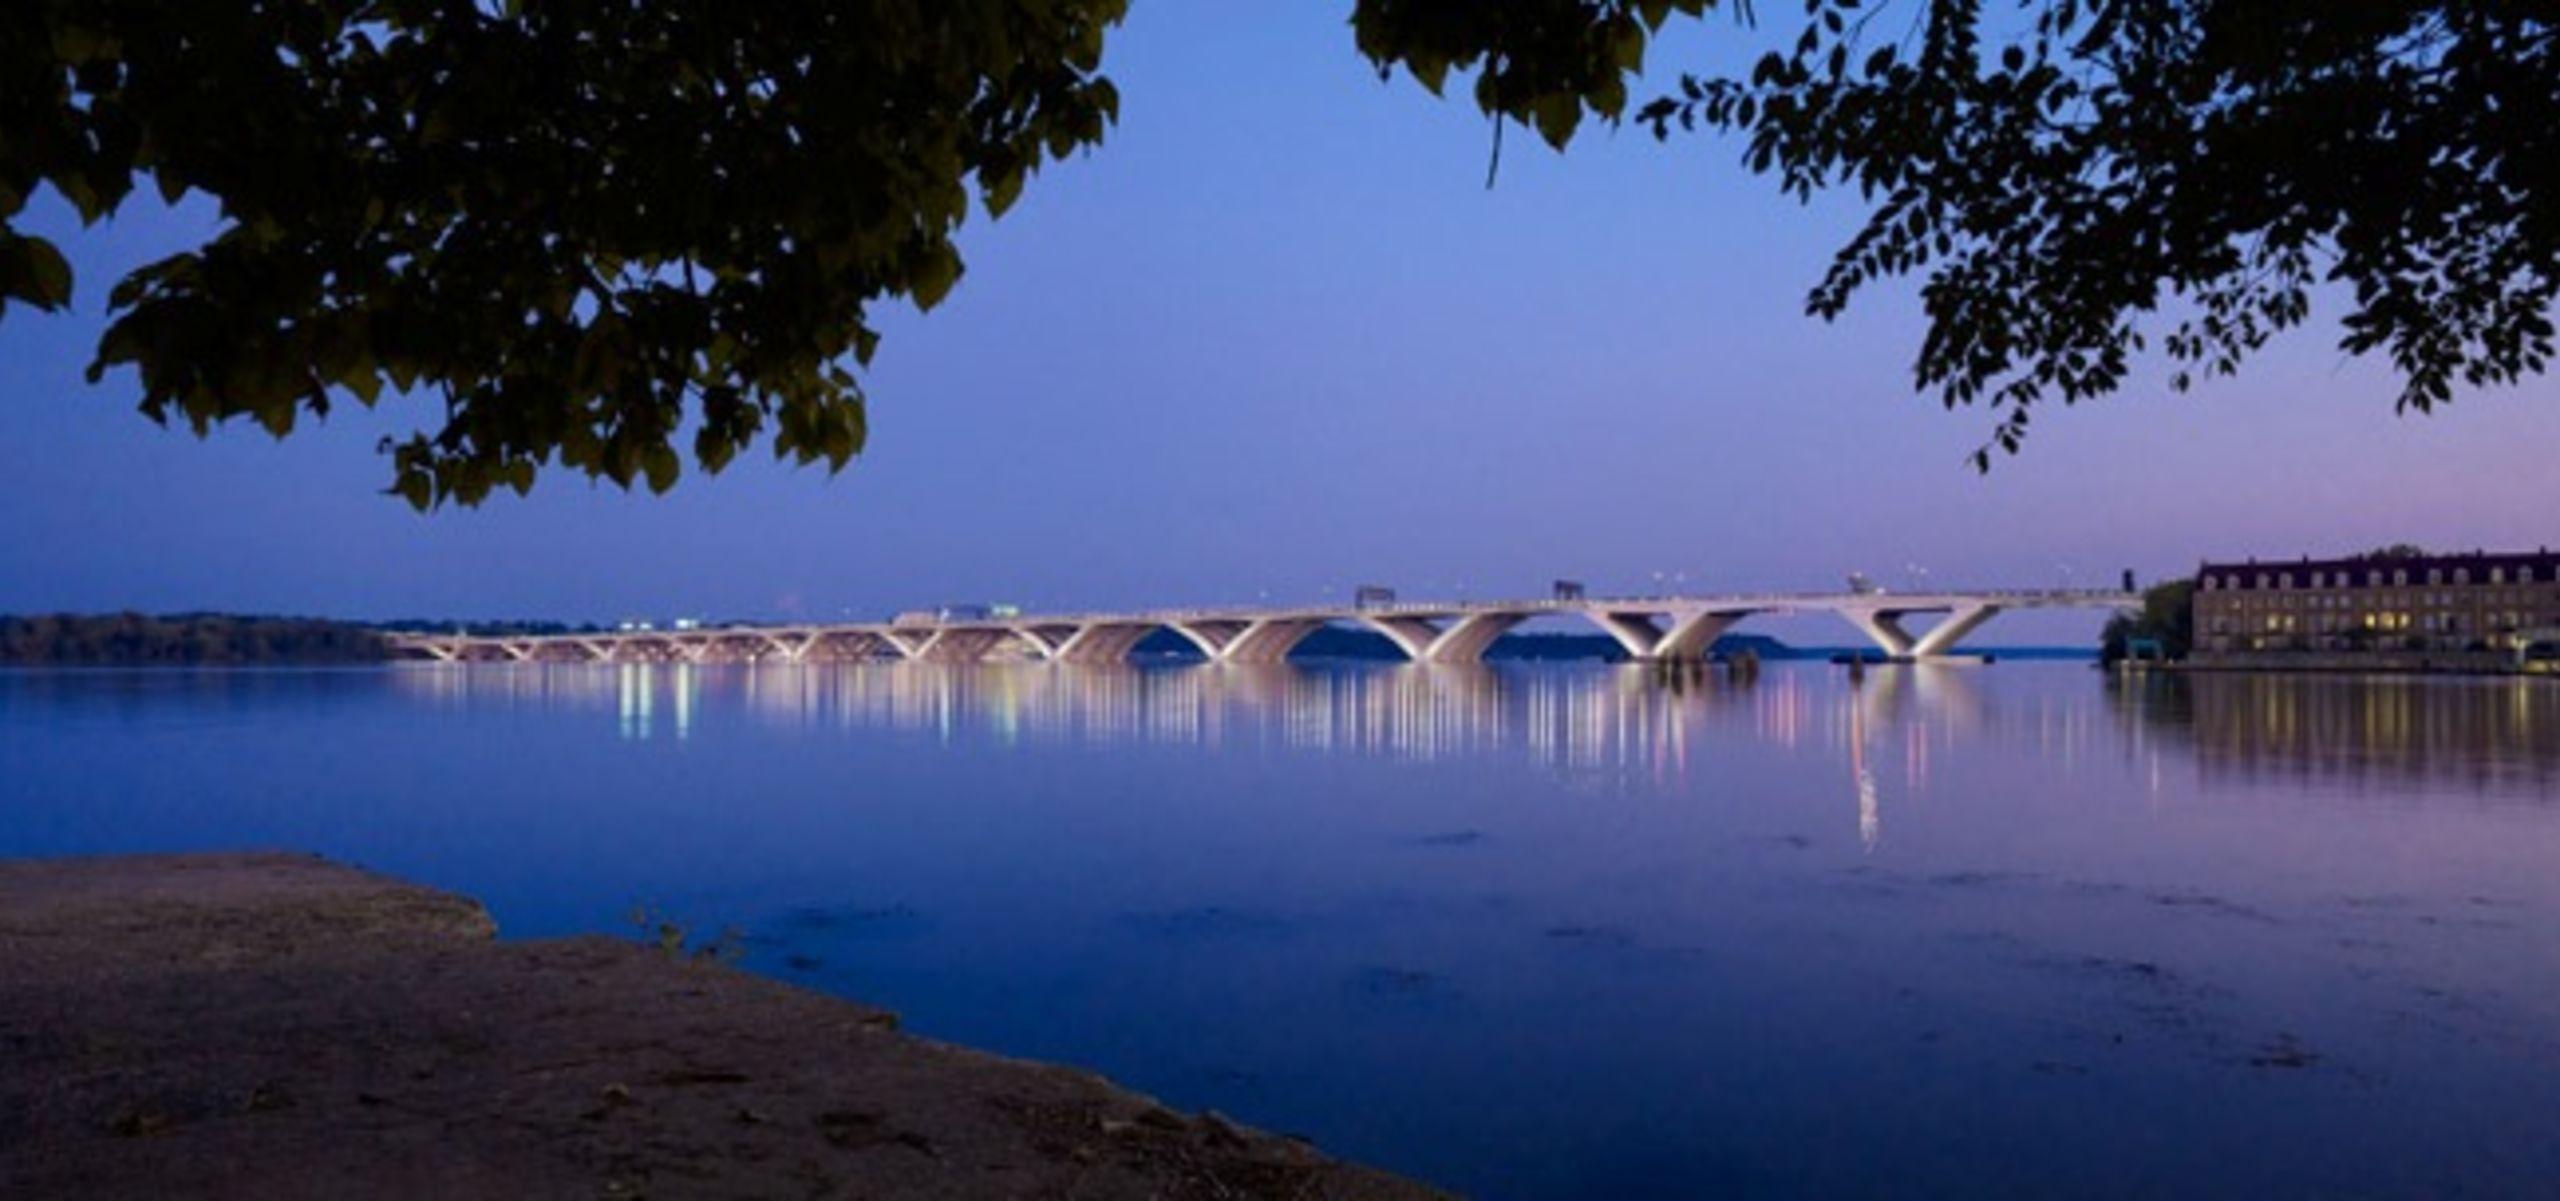 Discover Life Along The Potomac River in Alexandria and Arlington